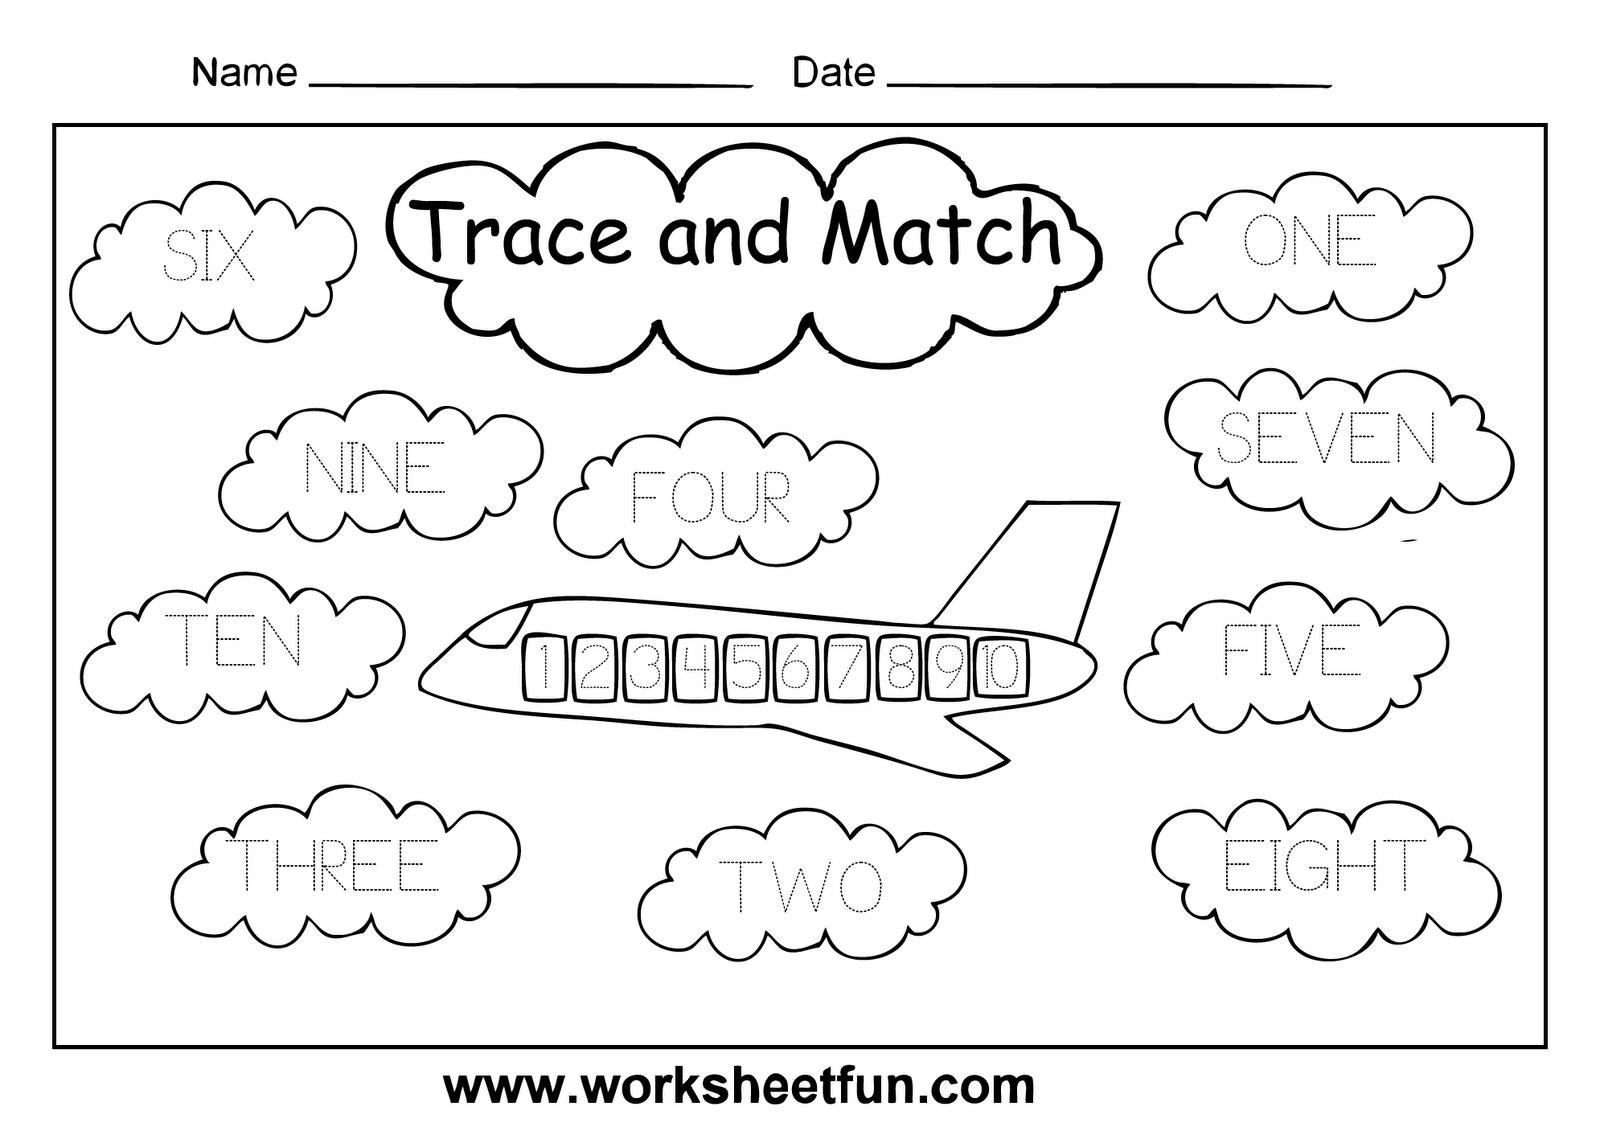 7 Best Images of Printable Number Words Worksheets ...